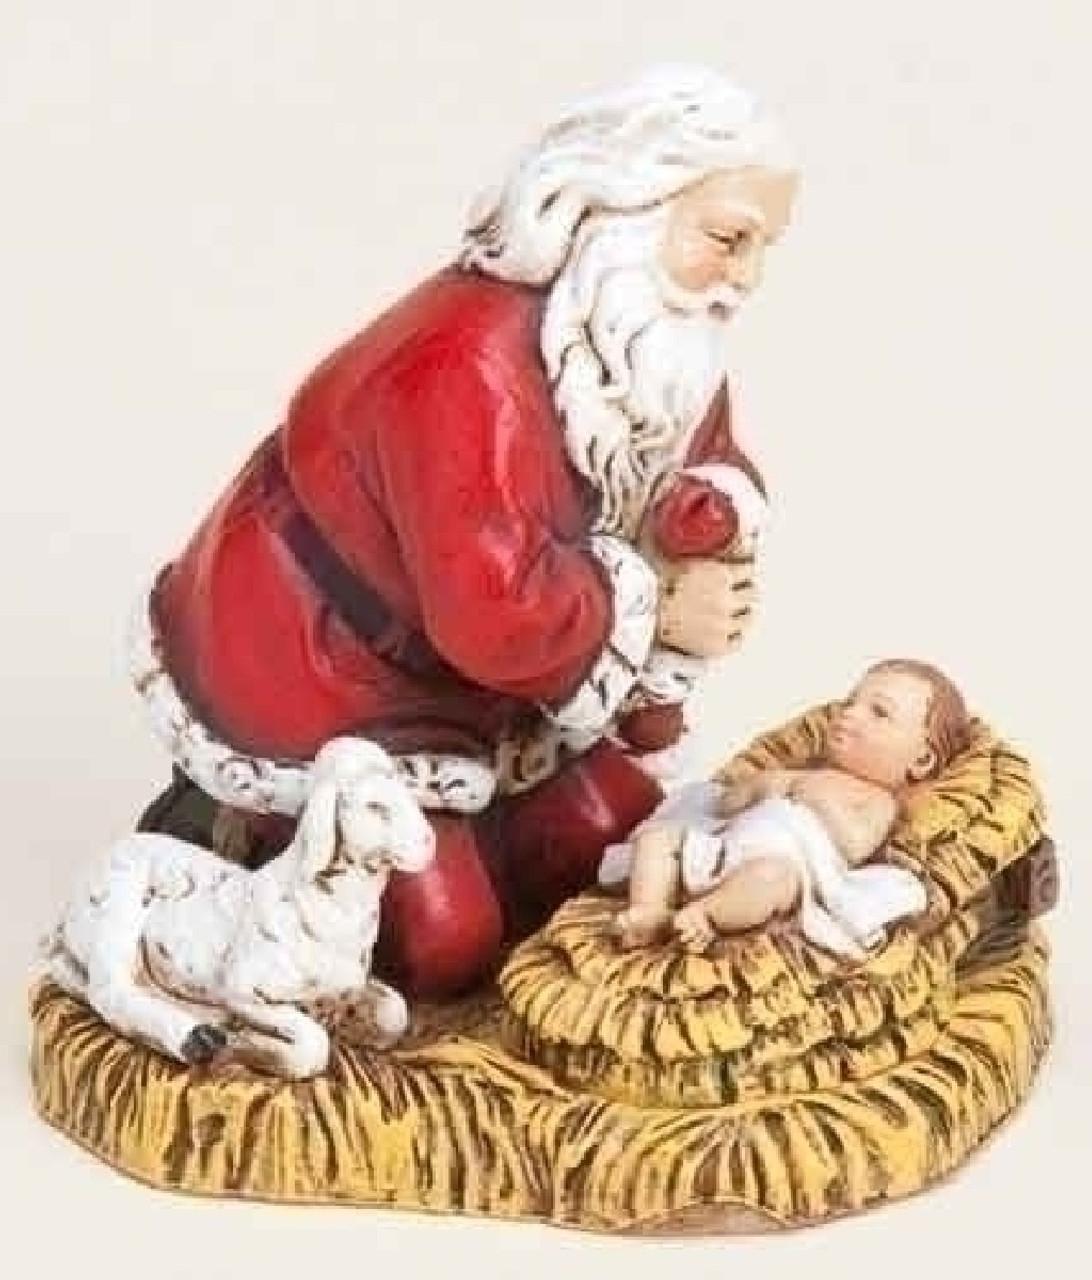 Joseph\'s Studio Kneeling Santa with Baby Jesus Christmas Ornament ...